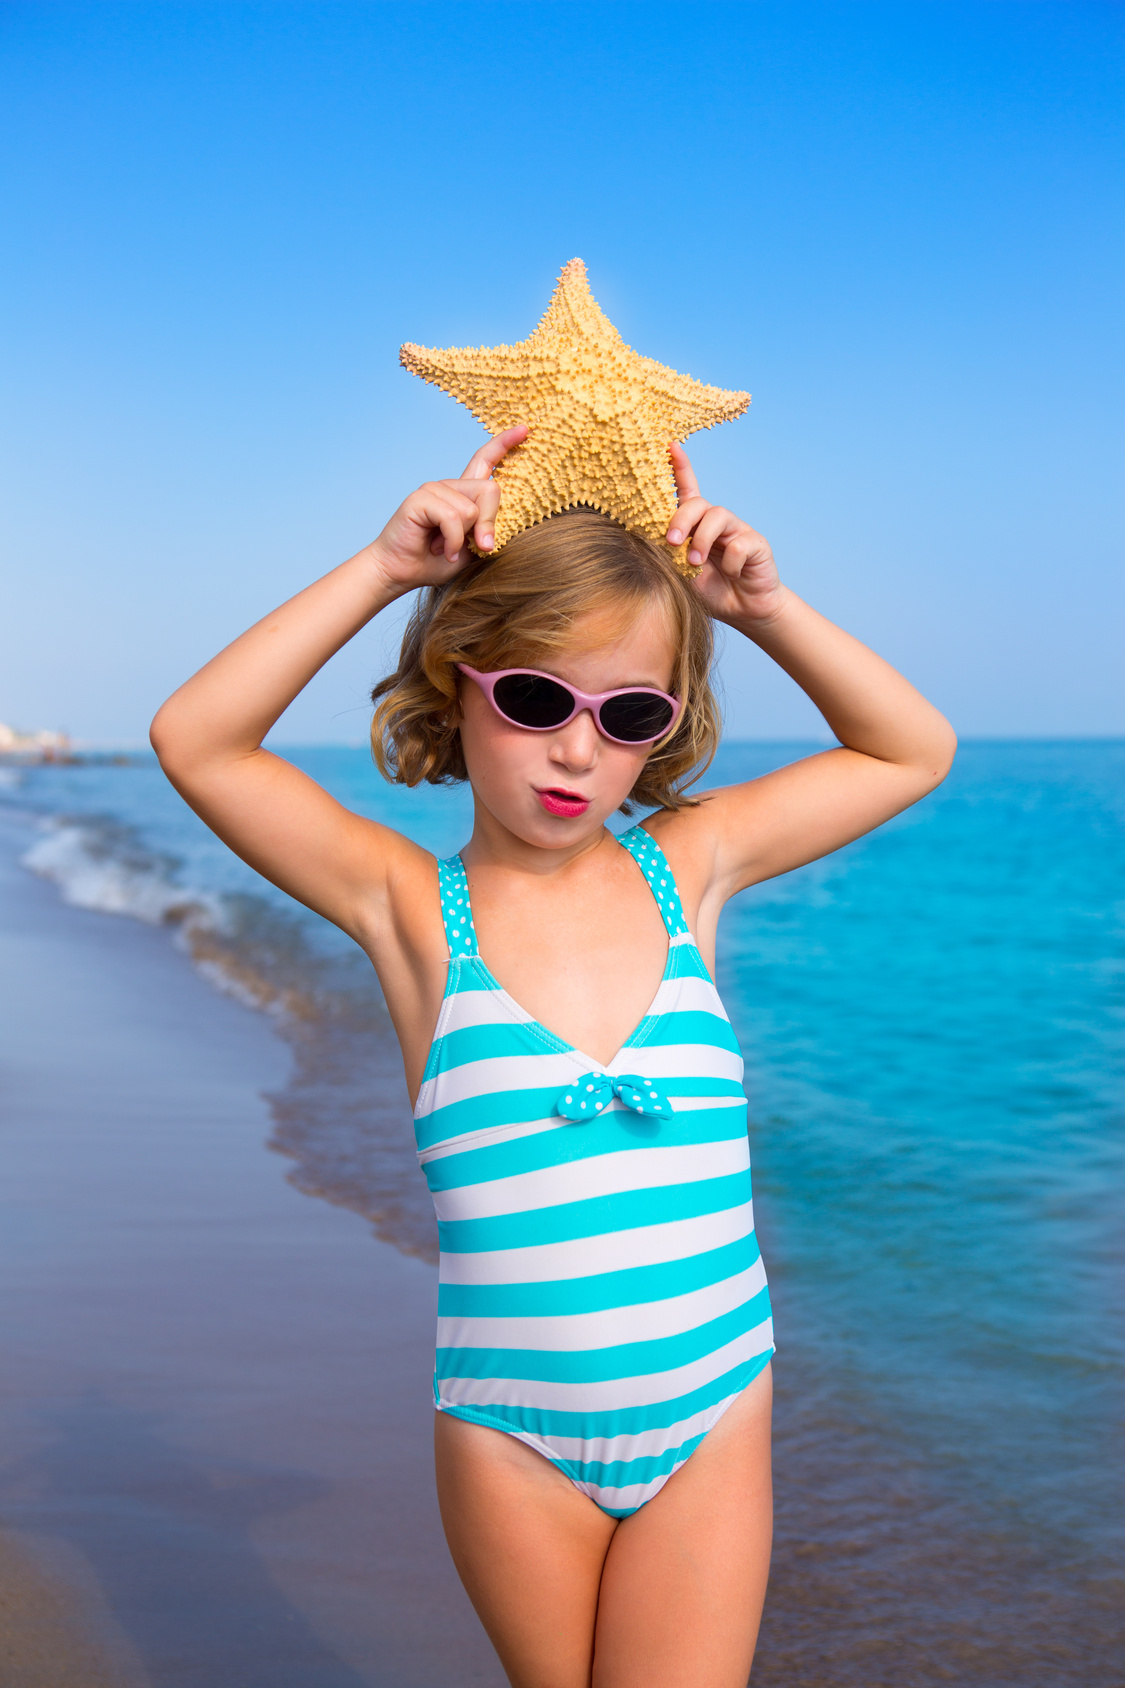 Девушек на пляжах: фото и картинки девушка на пляже